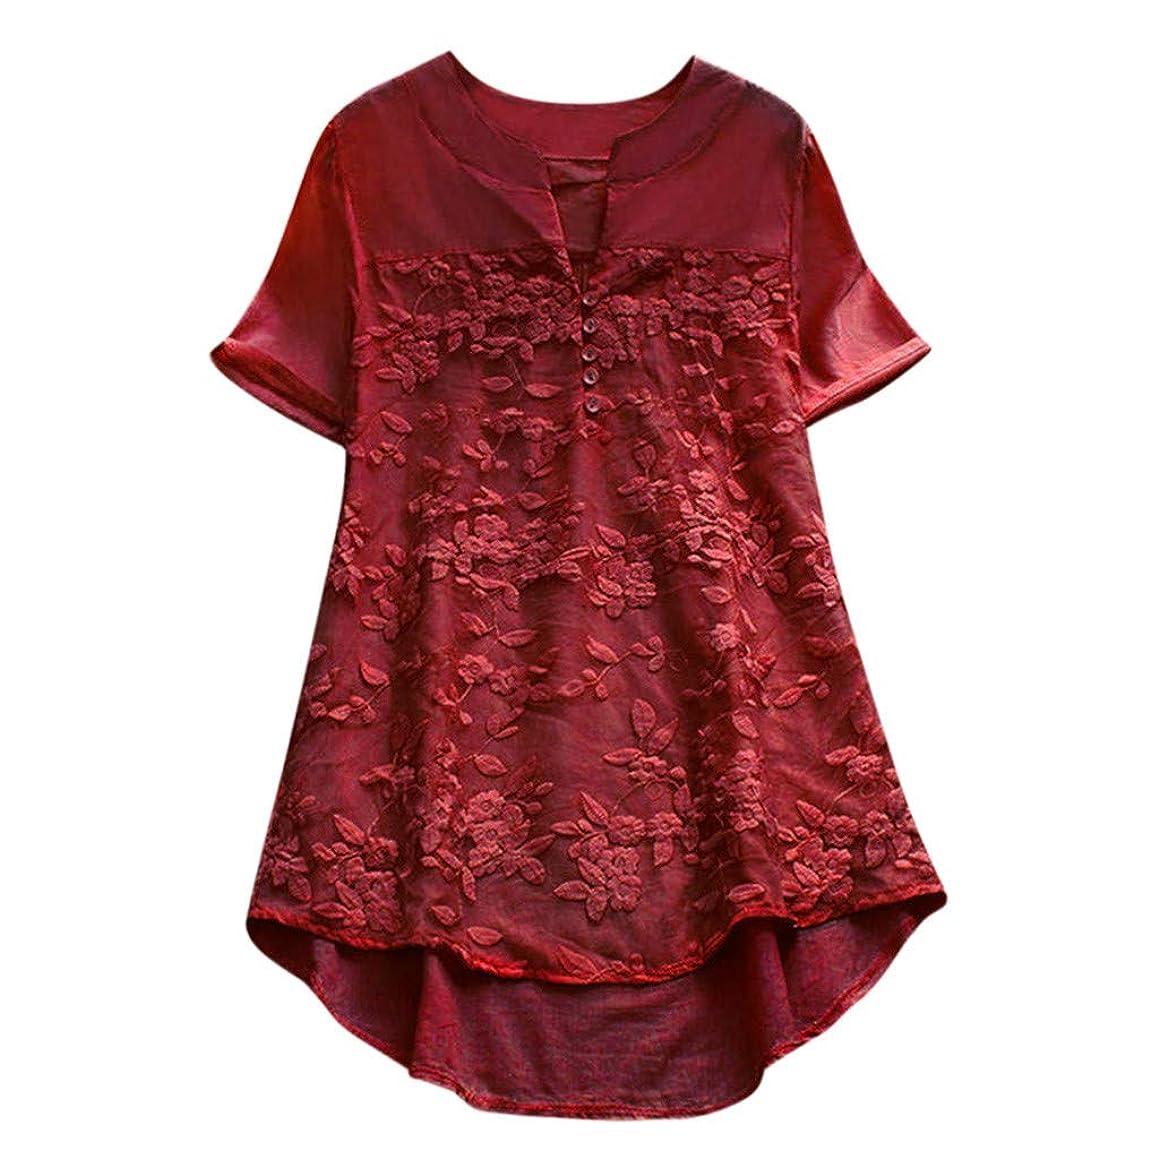 Cewtolkar Women Tops Floral Print Blouse Pullover T Shirt Short Sleeve Tunic Lace Shirt Cotton and Linen Tees